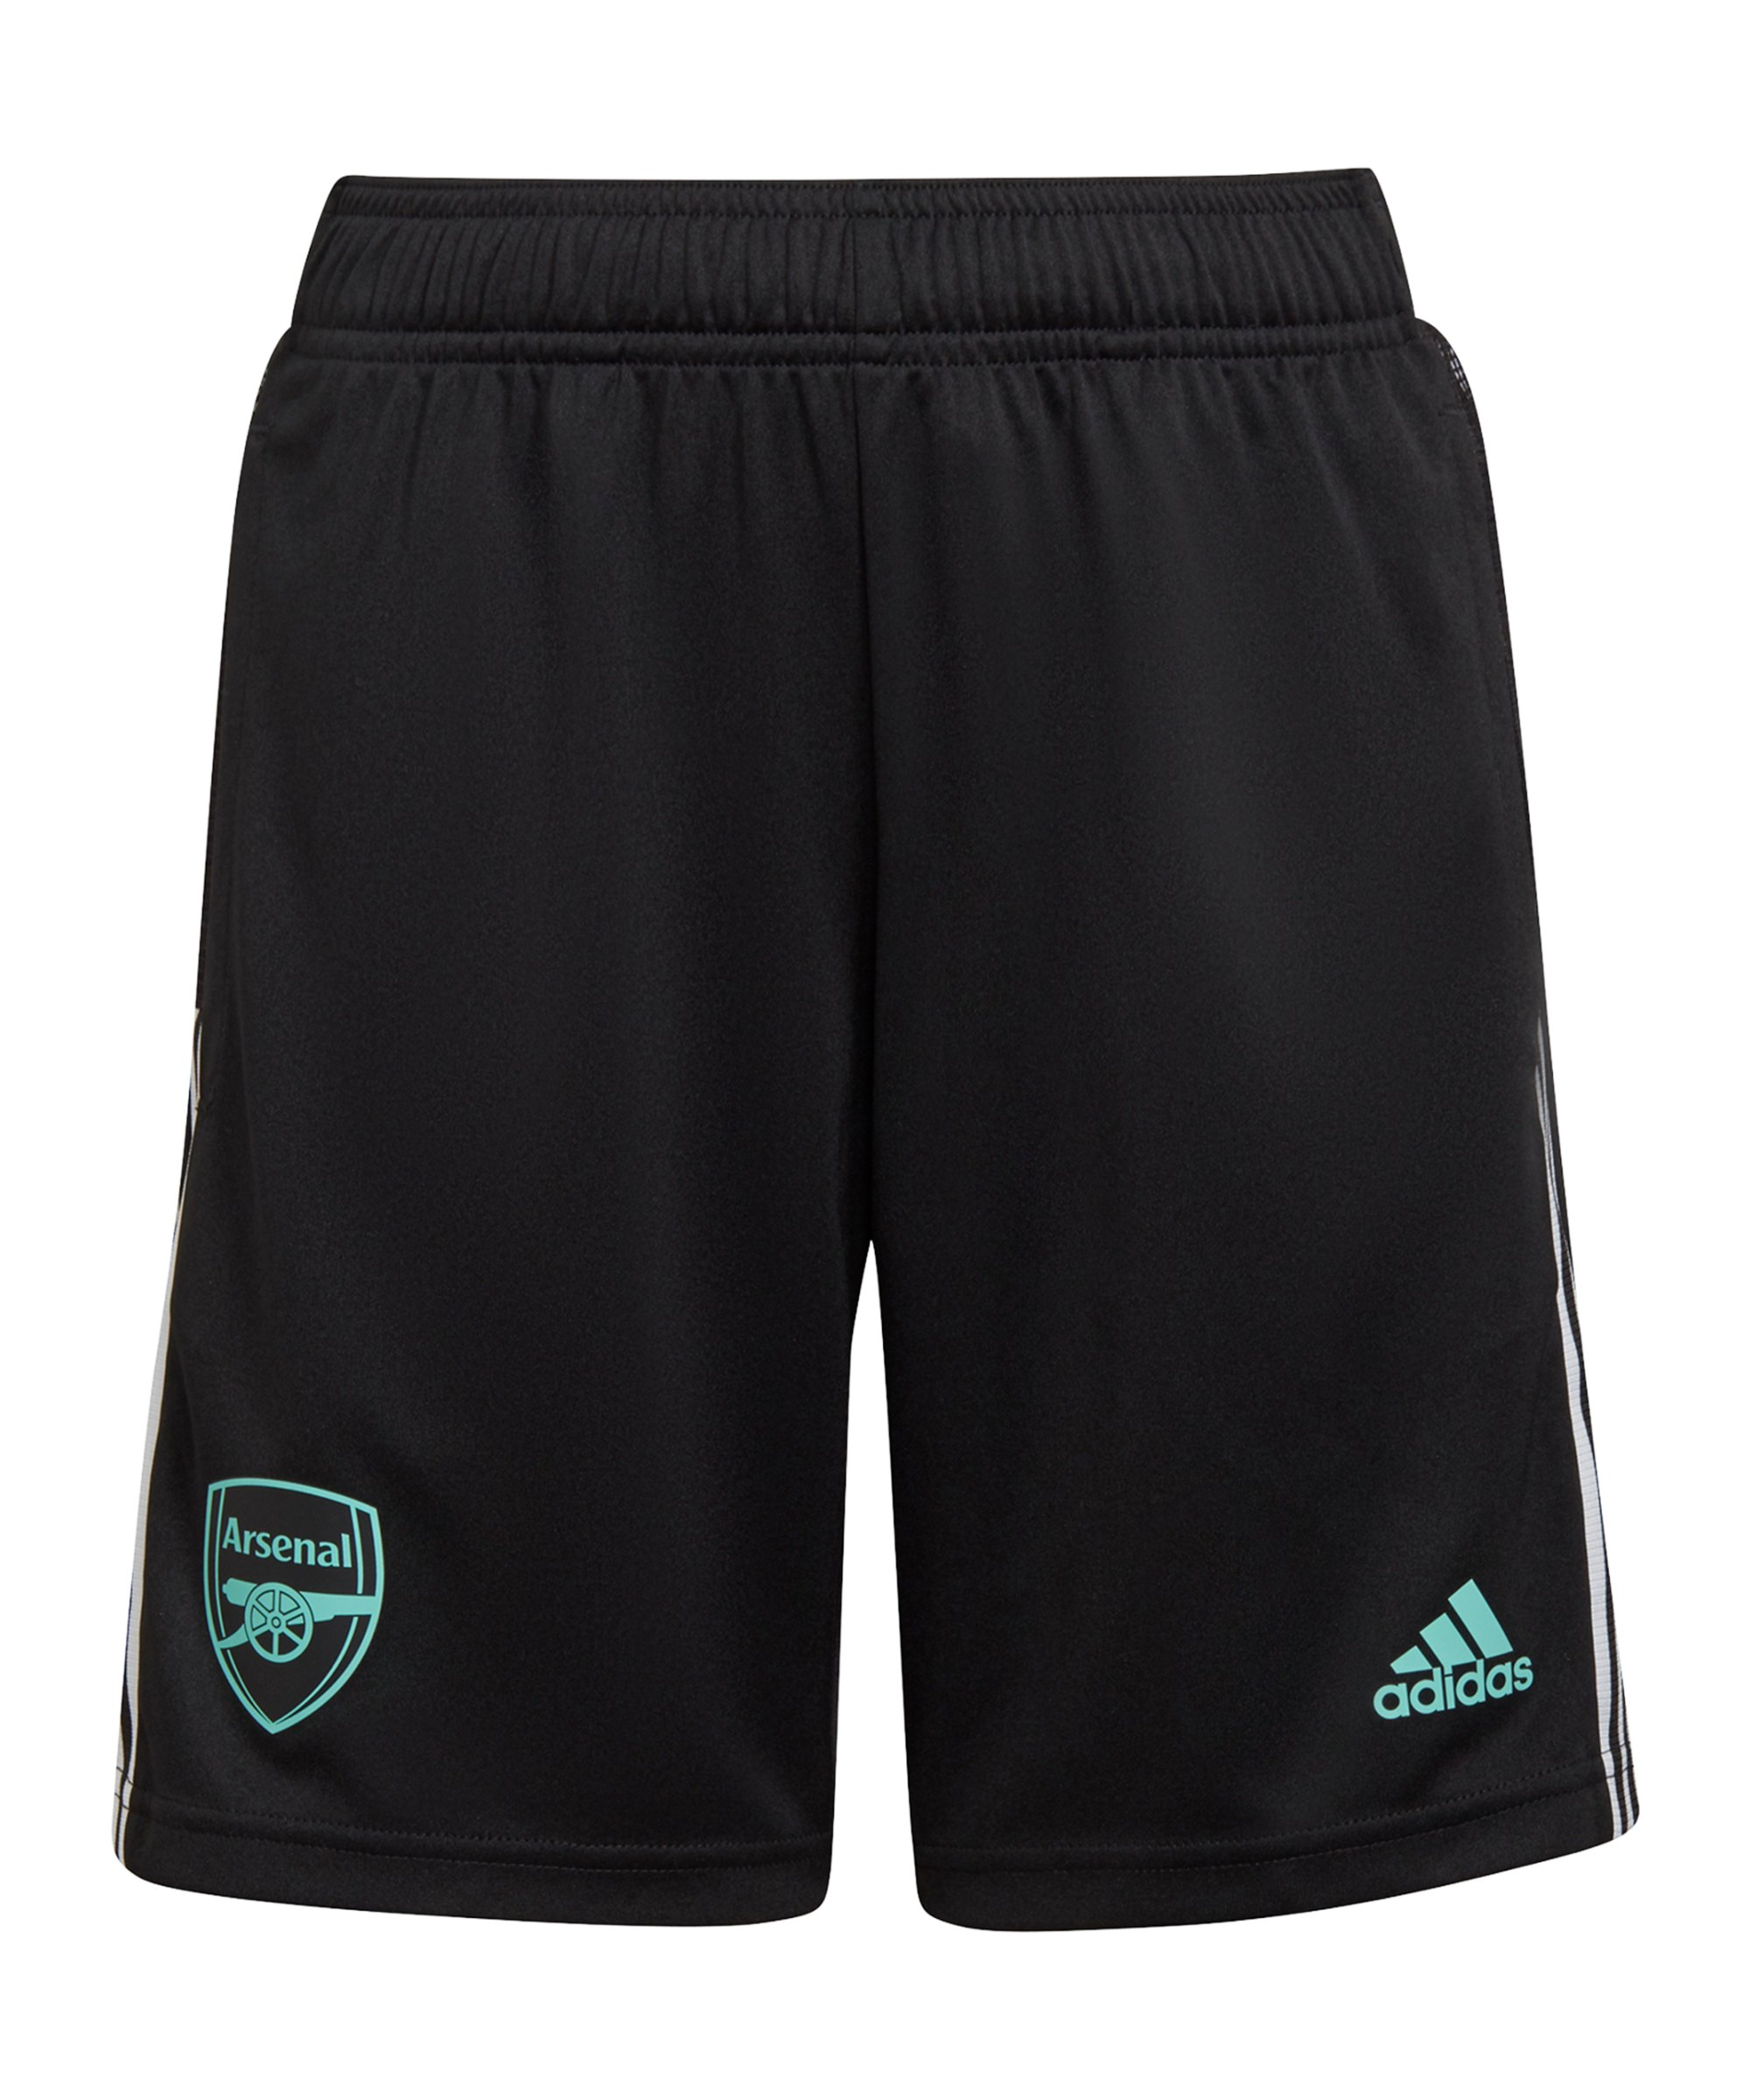 adidas FC Arsenal London Trainingsshort Kids Schwarz - schwarz